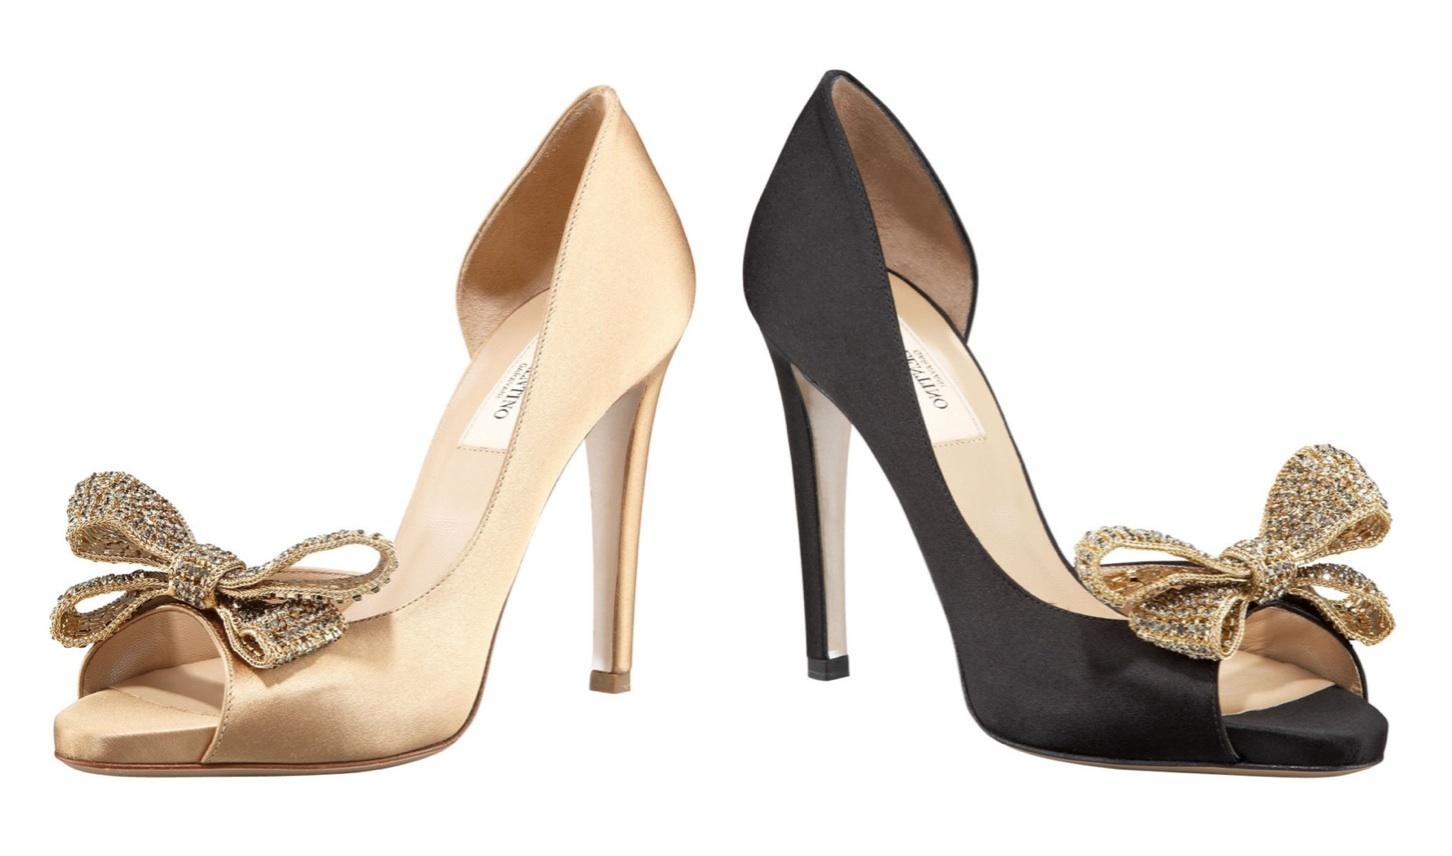 Valentino Wedding Shoes 018 - Valentino Wedding Shoes